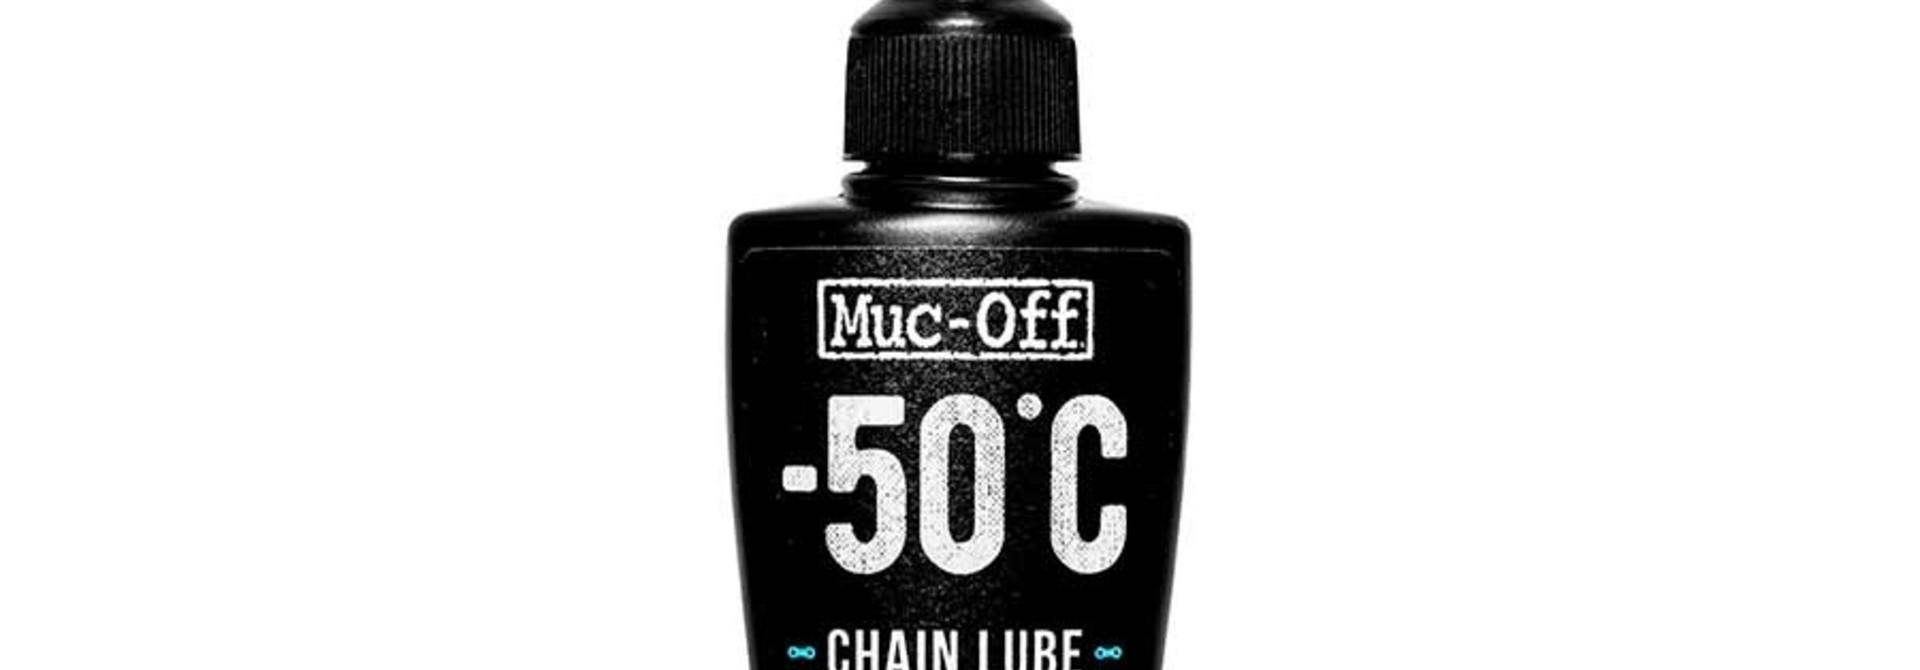 Muc-Off Lubricant 50ml, 980CA (-50C)